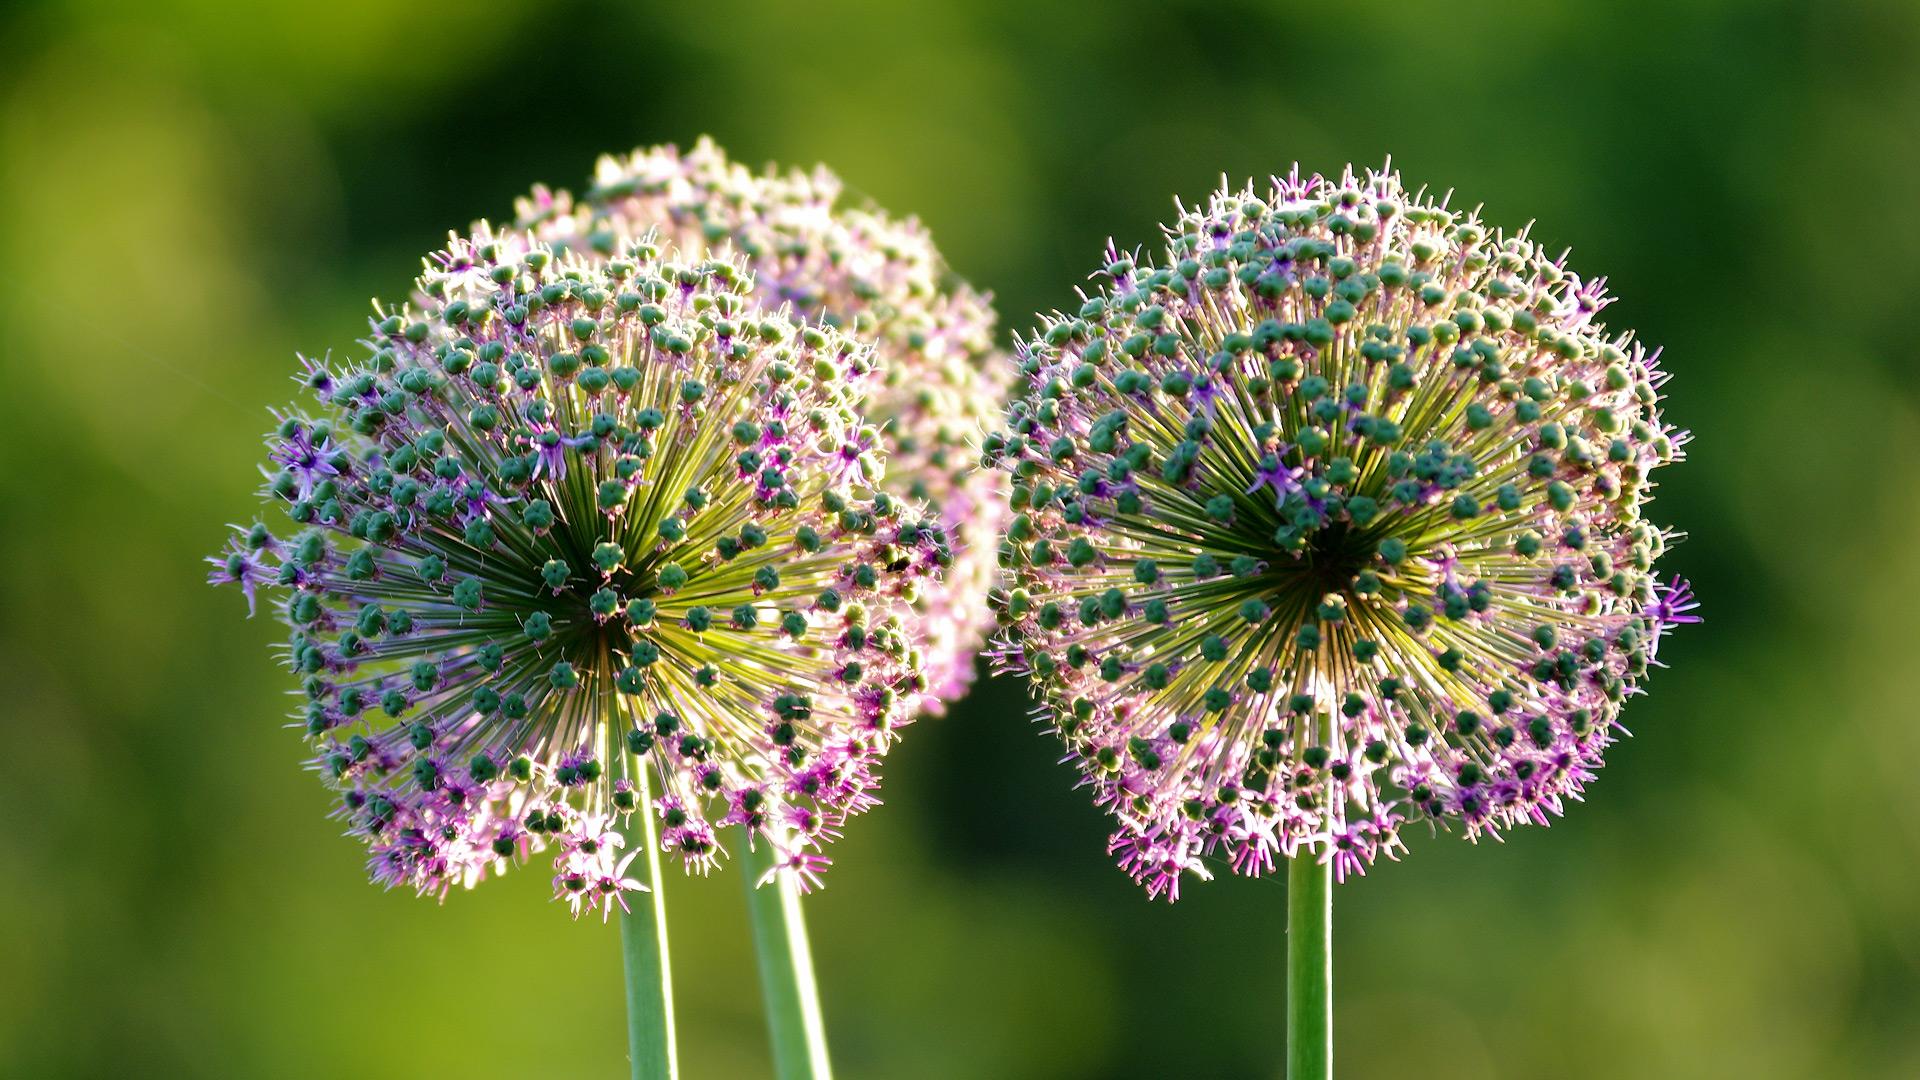 Zierlauch (Allium) - Anfang Juni abgeblüht